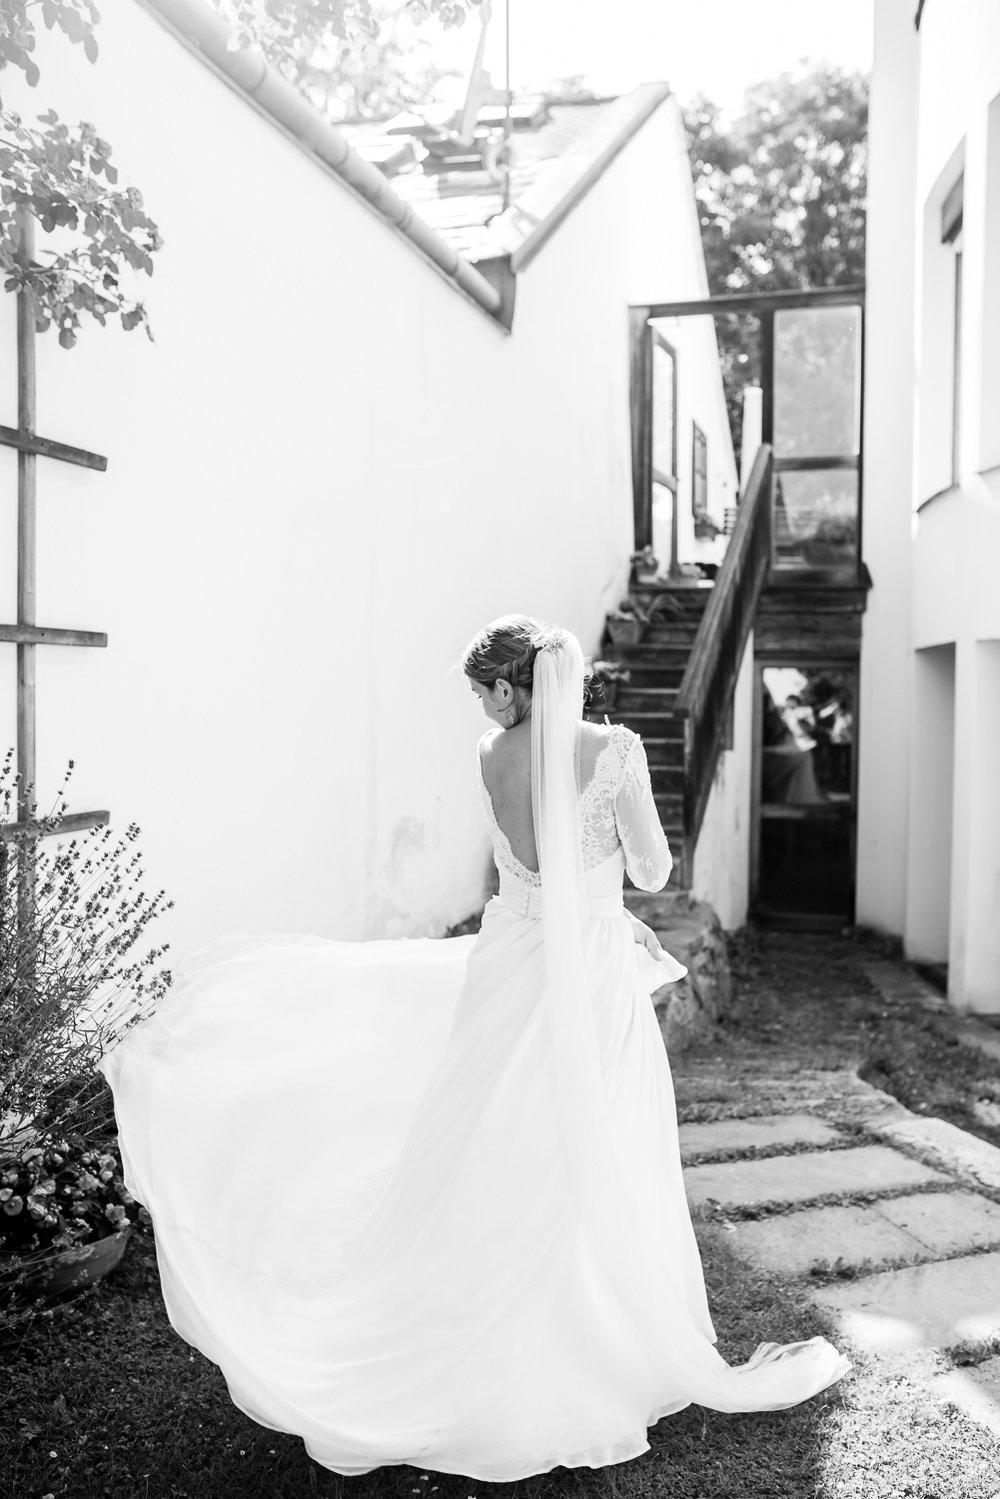 constantin-wedding-photography-33.jpg